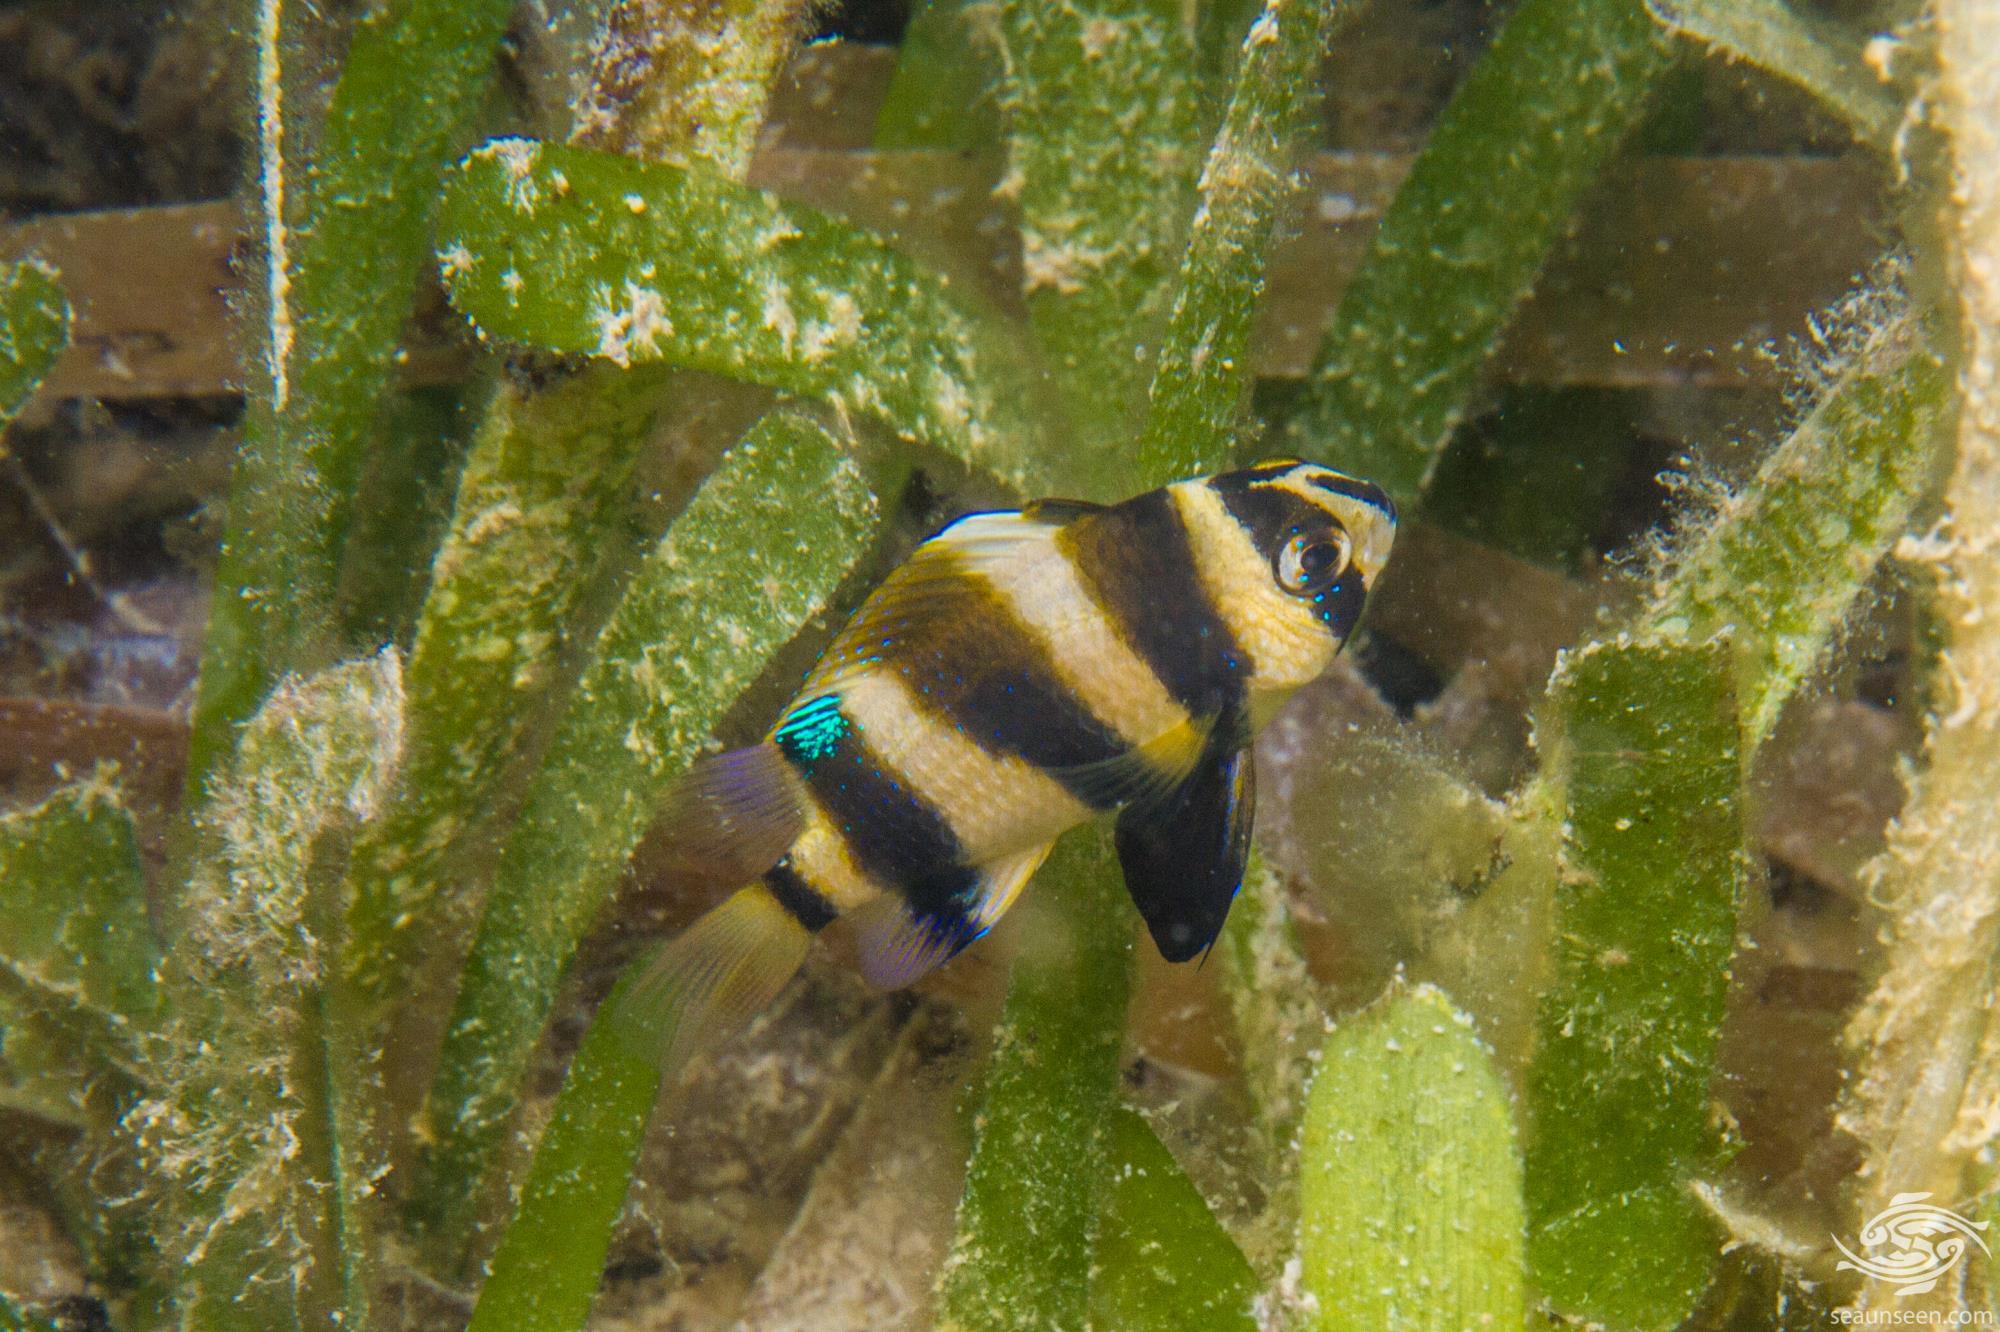 Tiger Damselfish (Chrysiptera annulata) is also known as the Footballer demoiselle